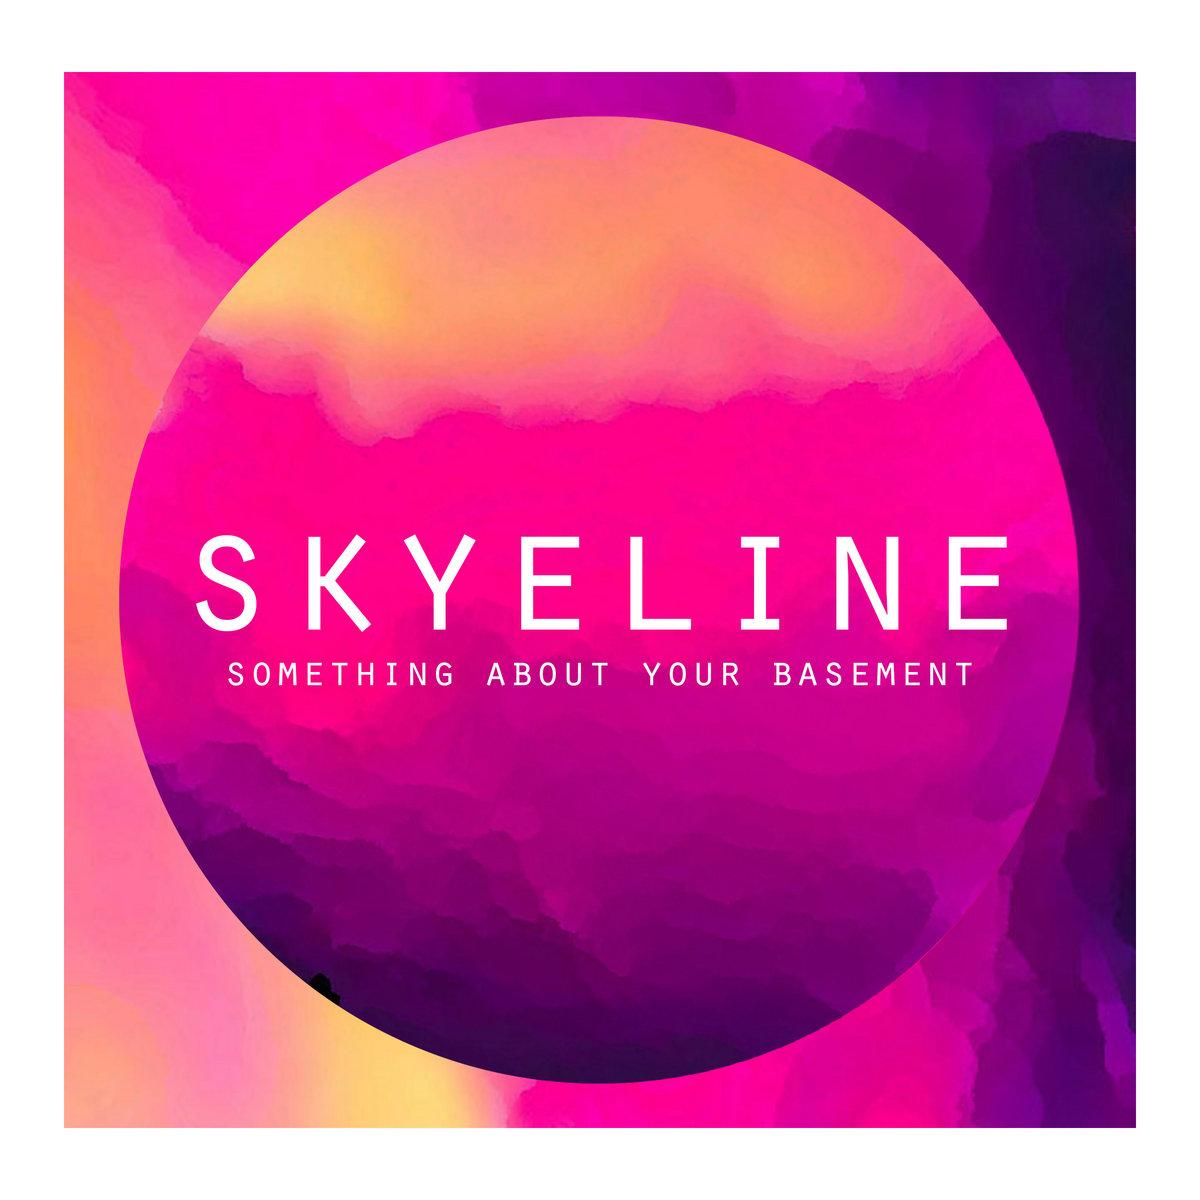 www.facebook.com/skyelinetheband